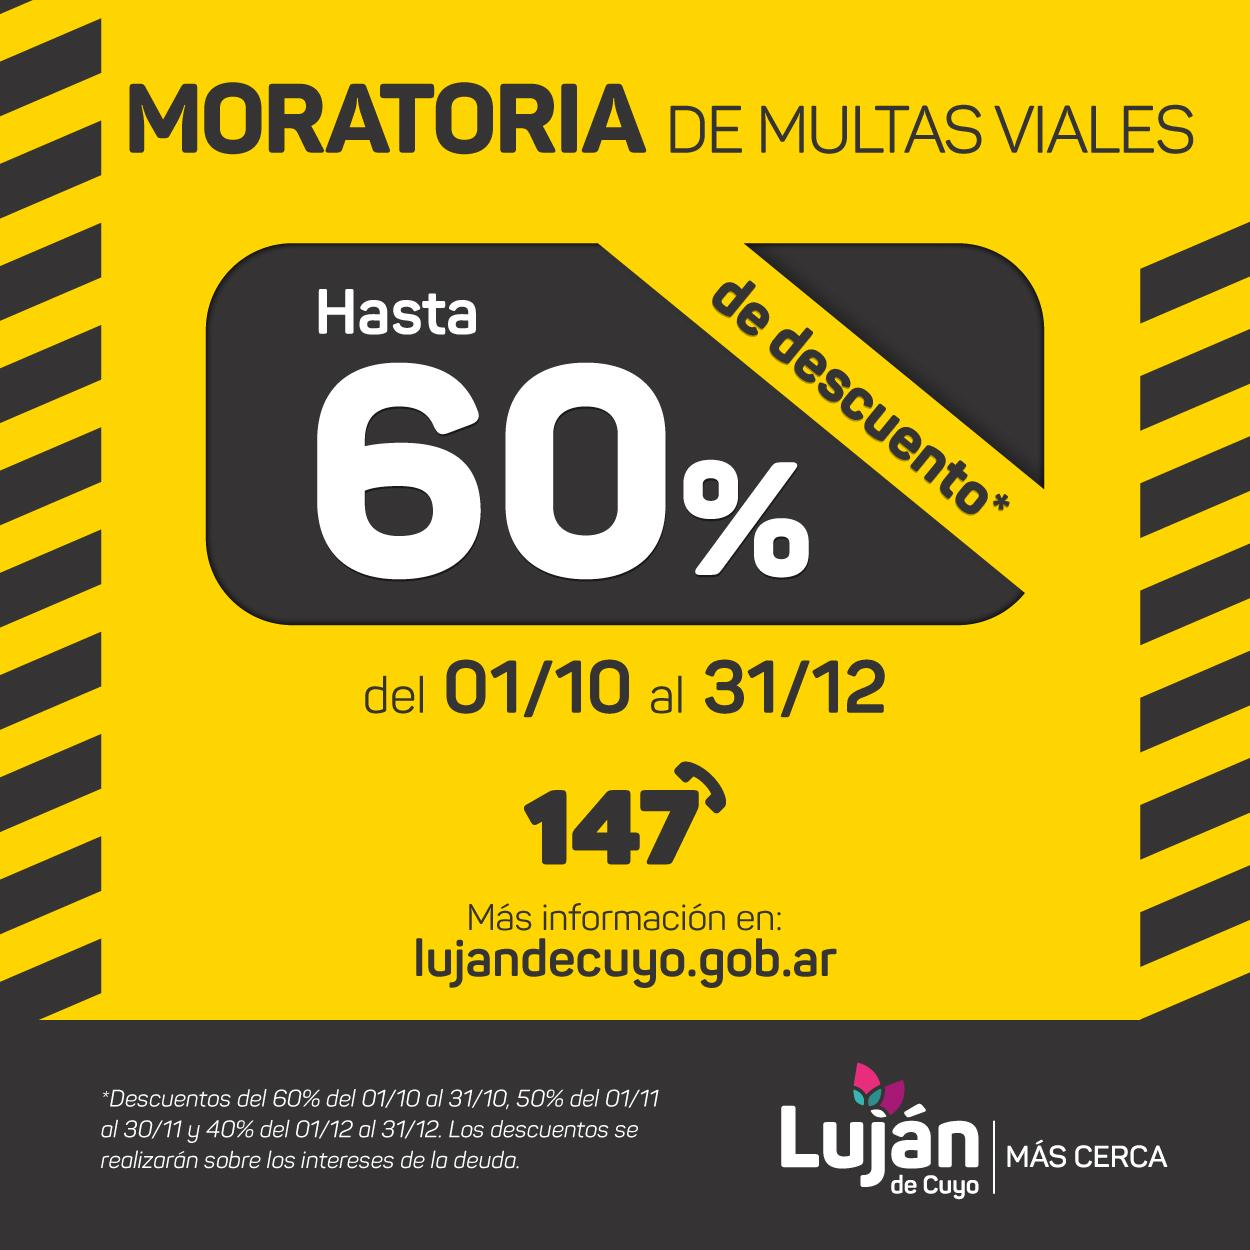 Moratoria Multas Viales